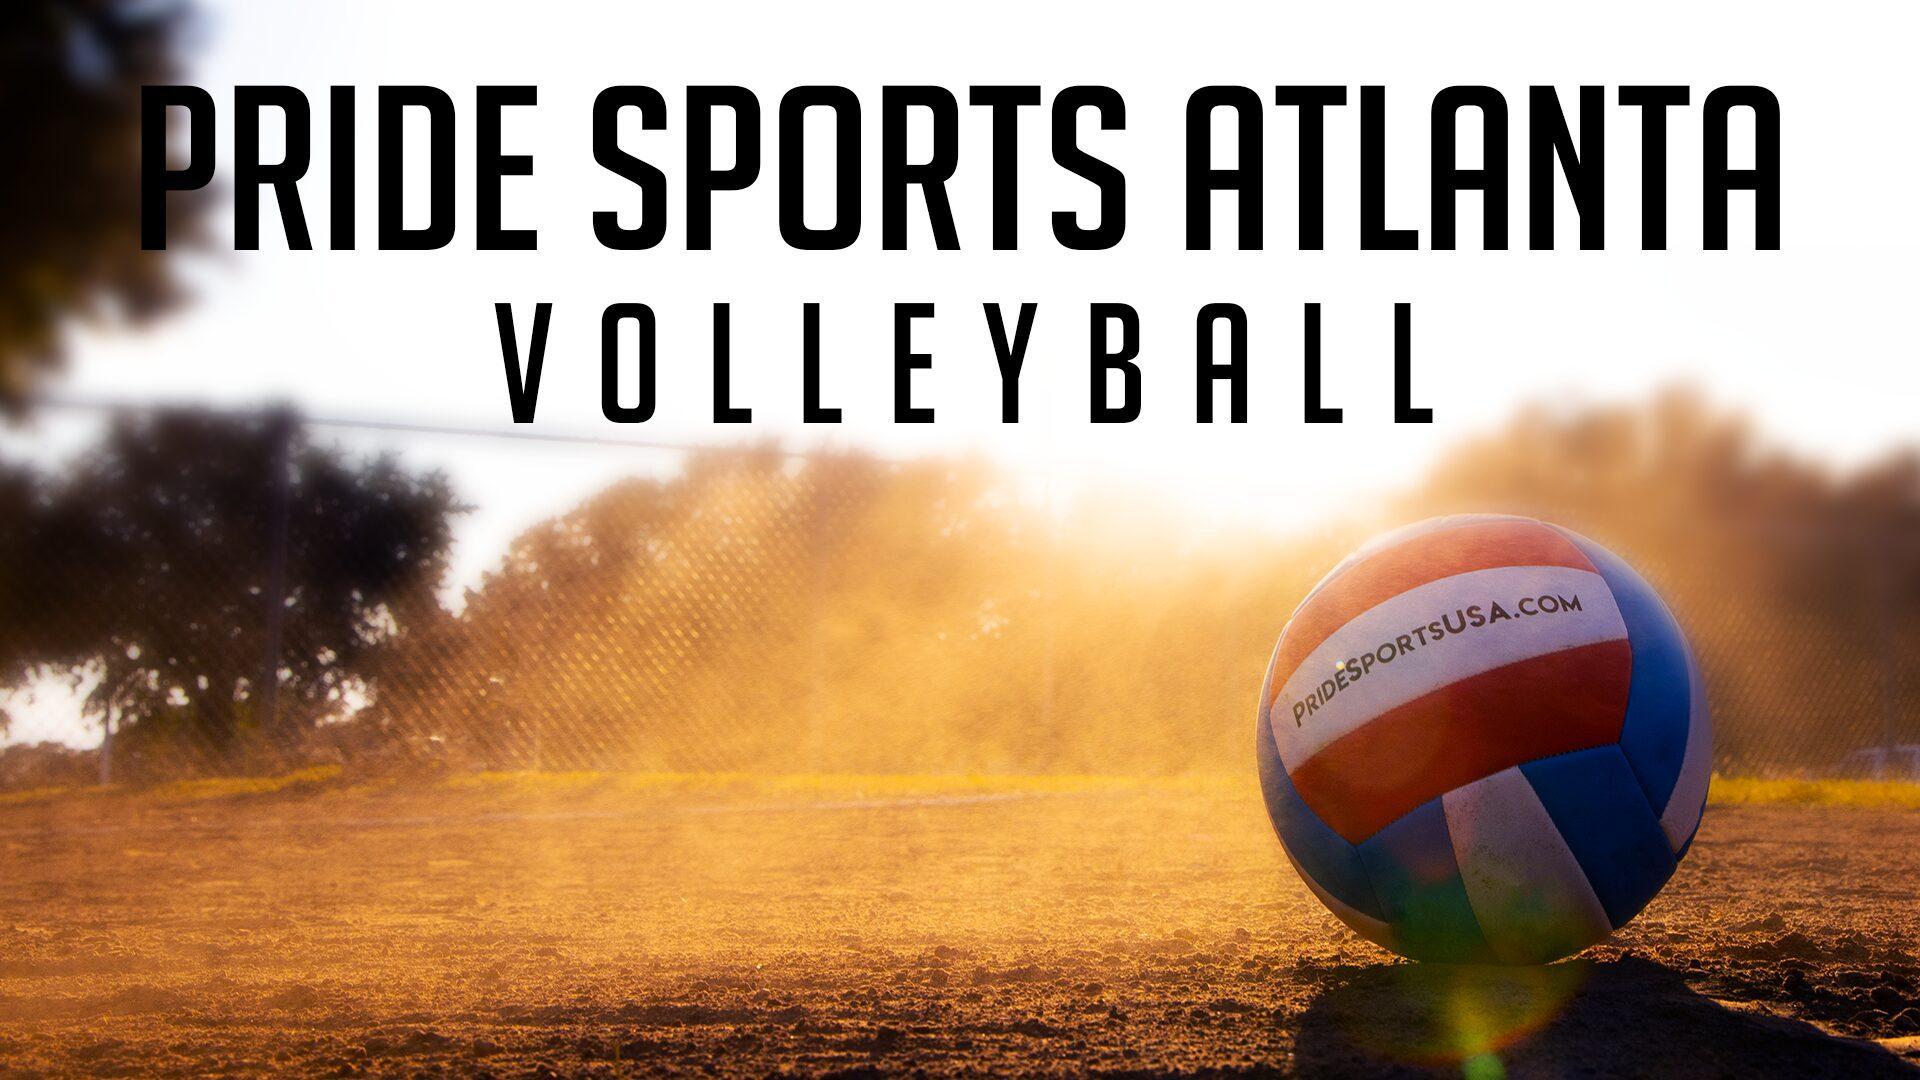 Pride Sports Atlanta Volleyball